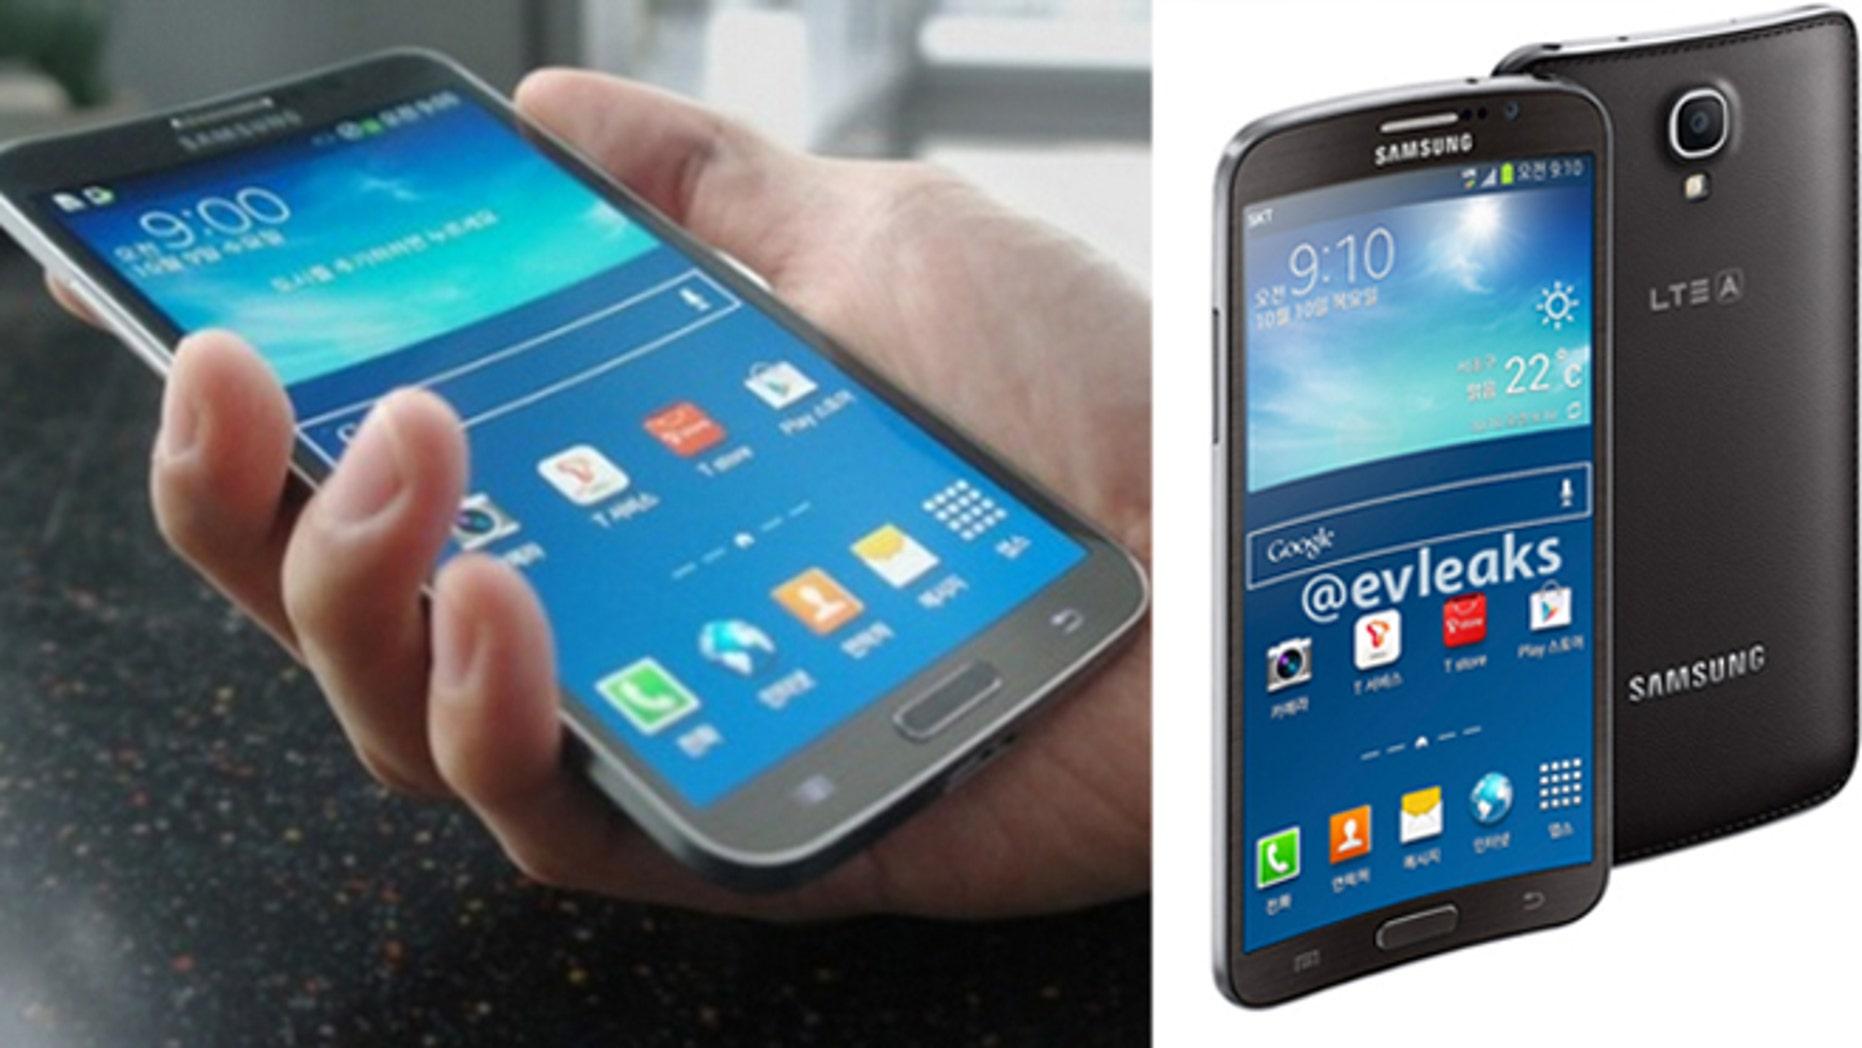 The Samsung Galaxy Round. Credit: Samsung Tomorrow